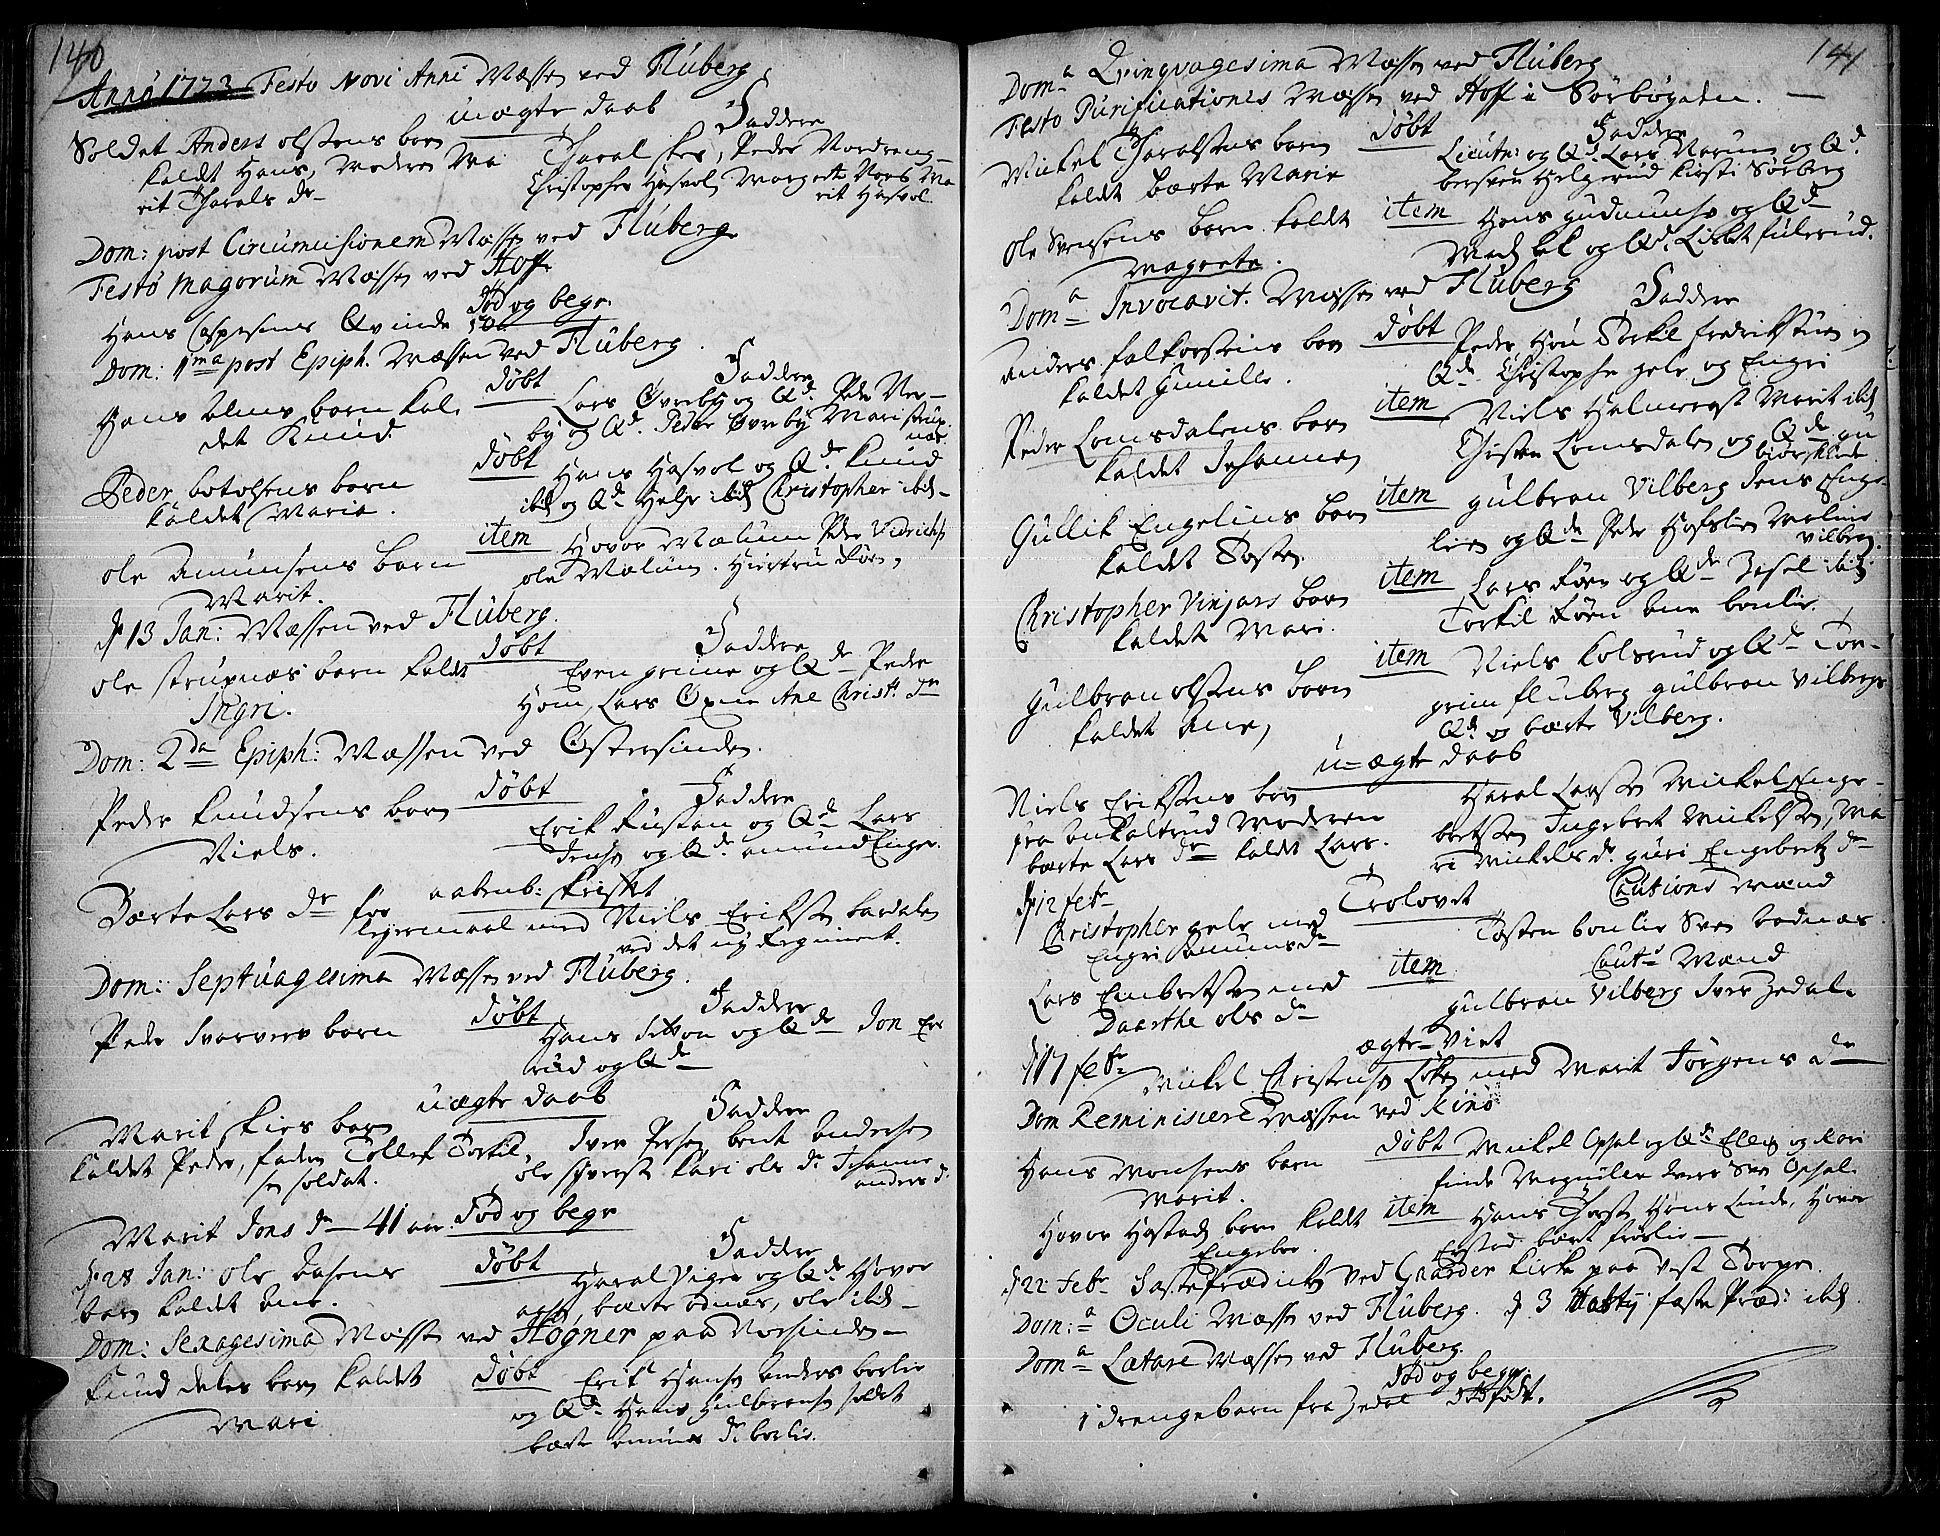 SAH, Land prestekontor, Ministerialbok nr. 1, 1708-1732, s. 140-141